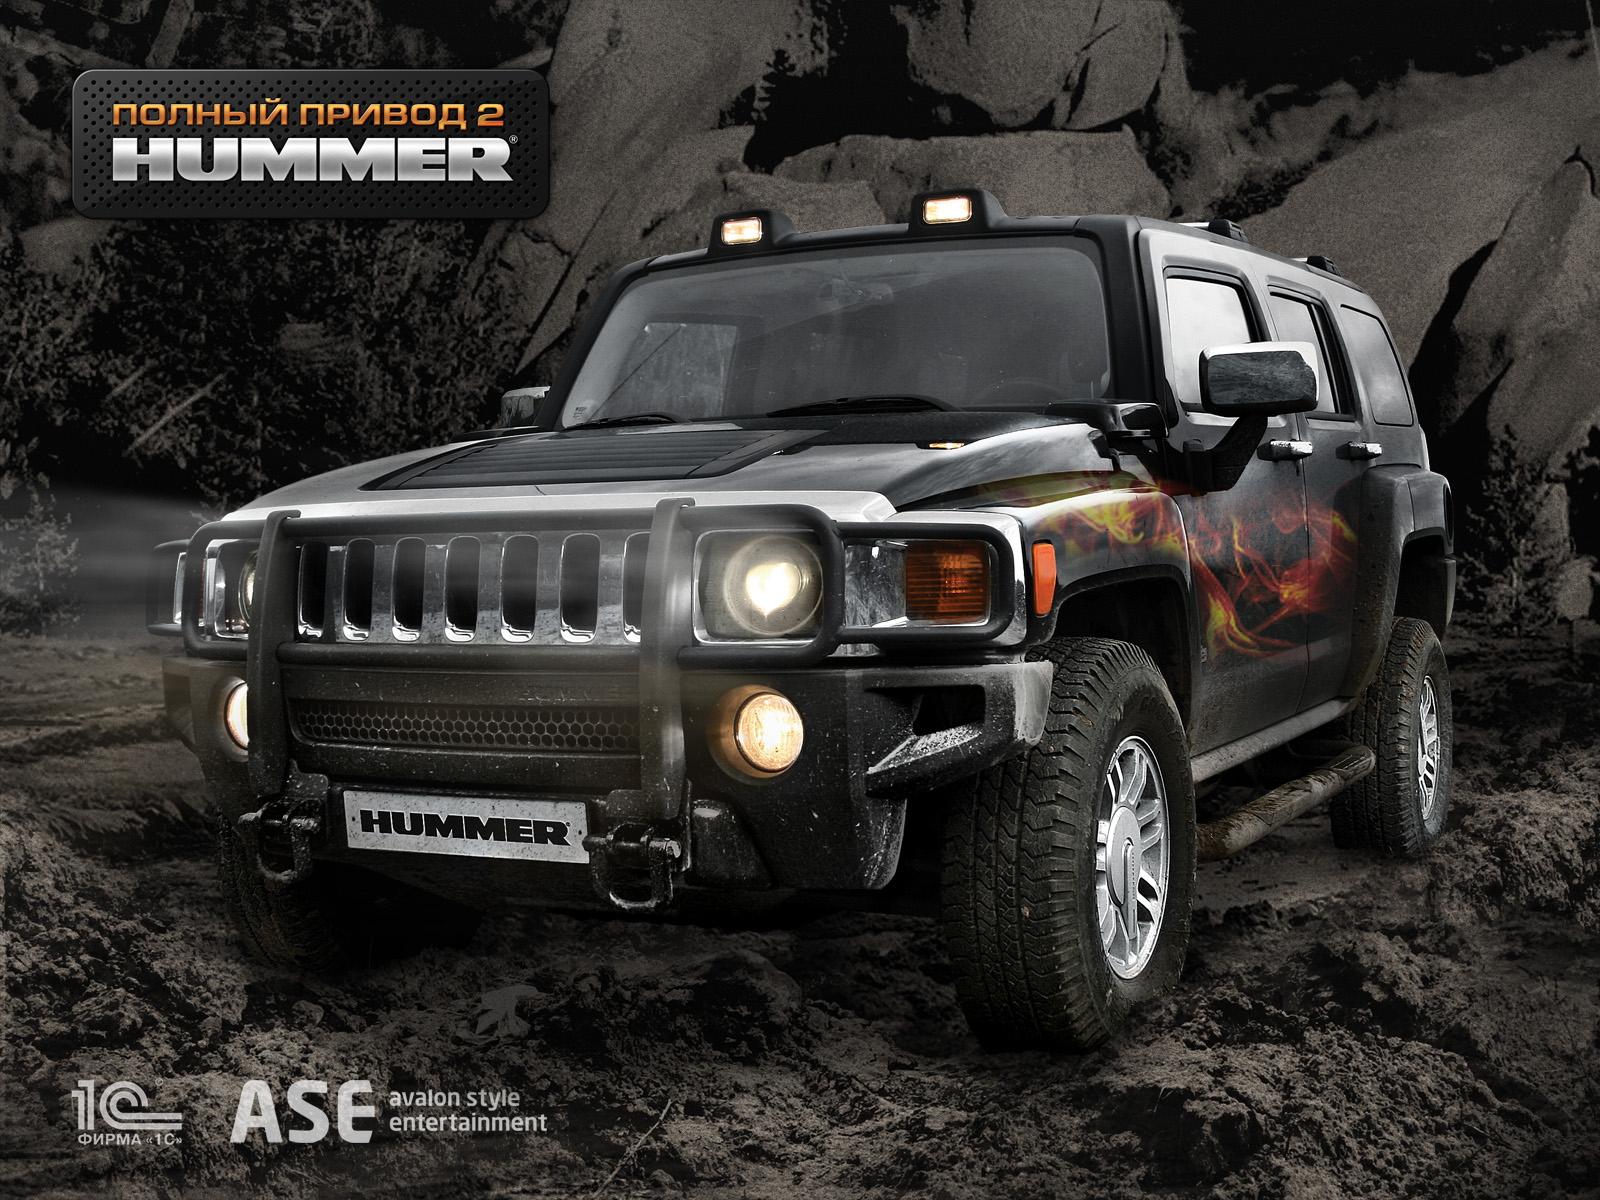 Арт к игре Full Drive 4x4 part 2: Hummer